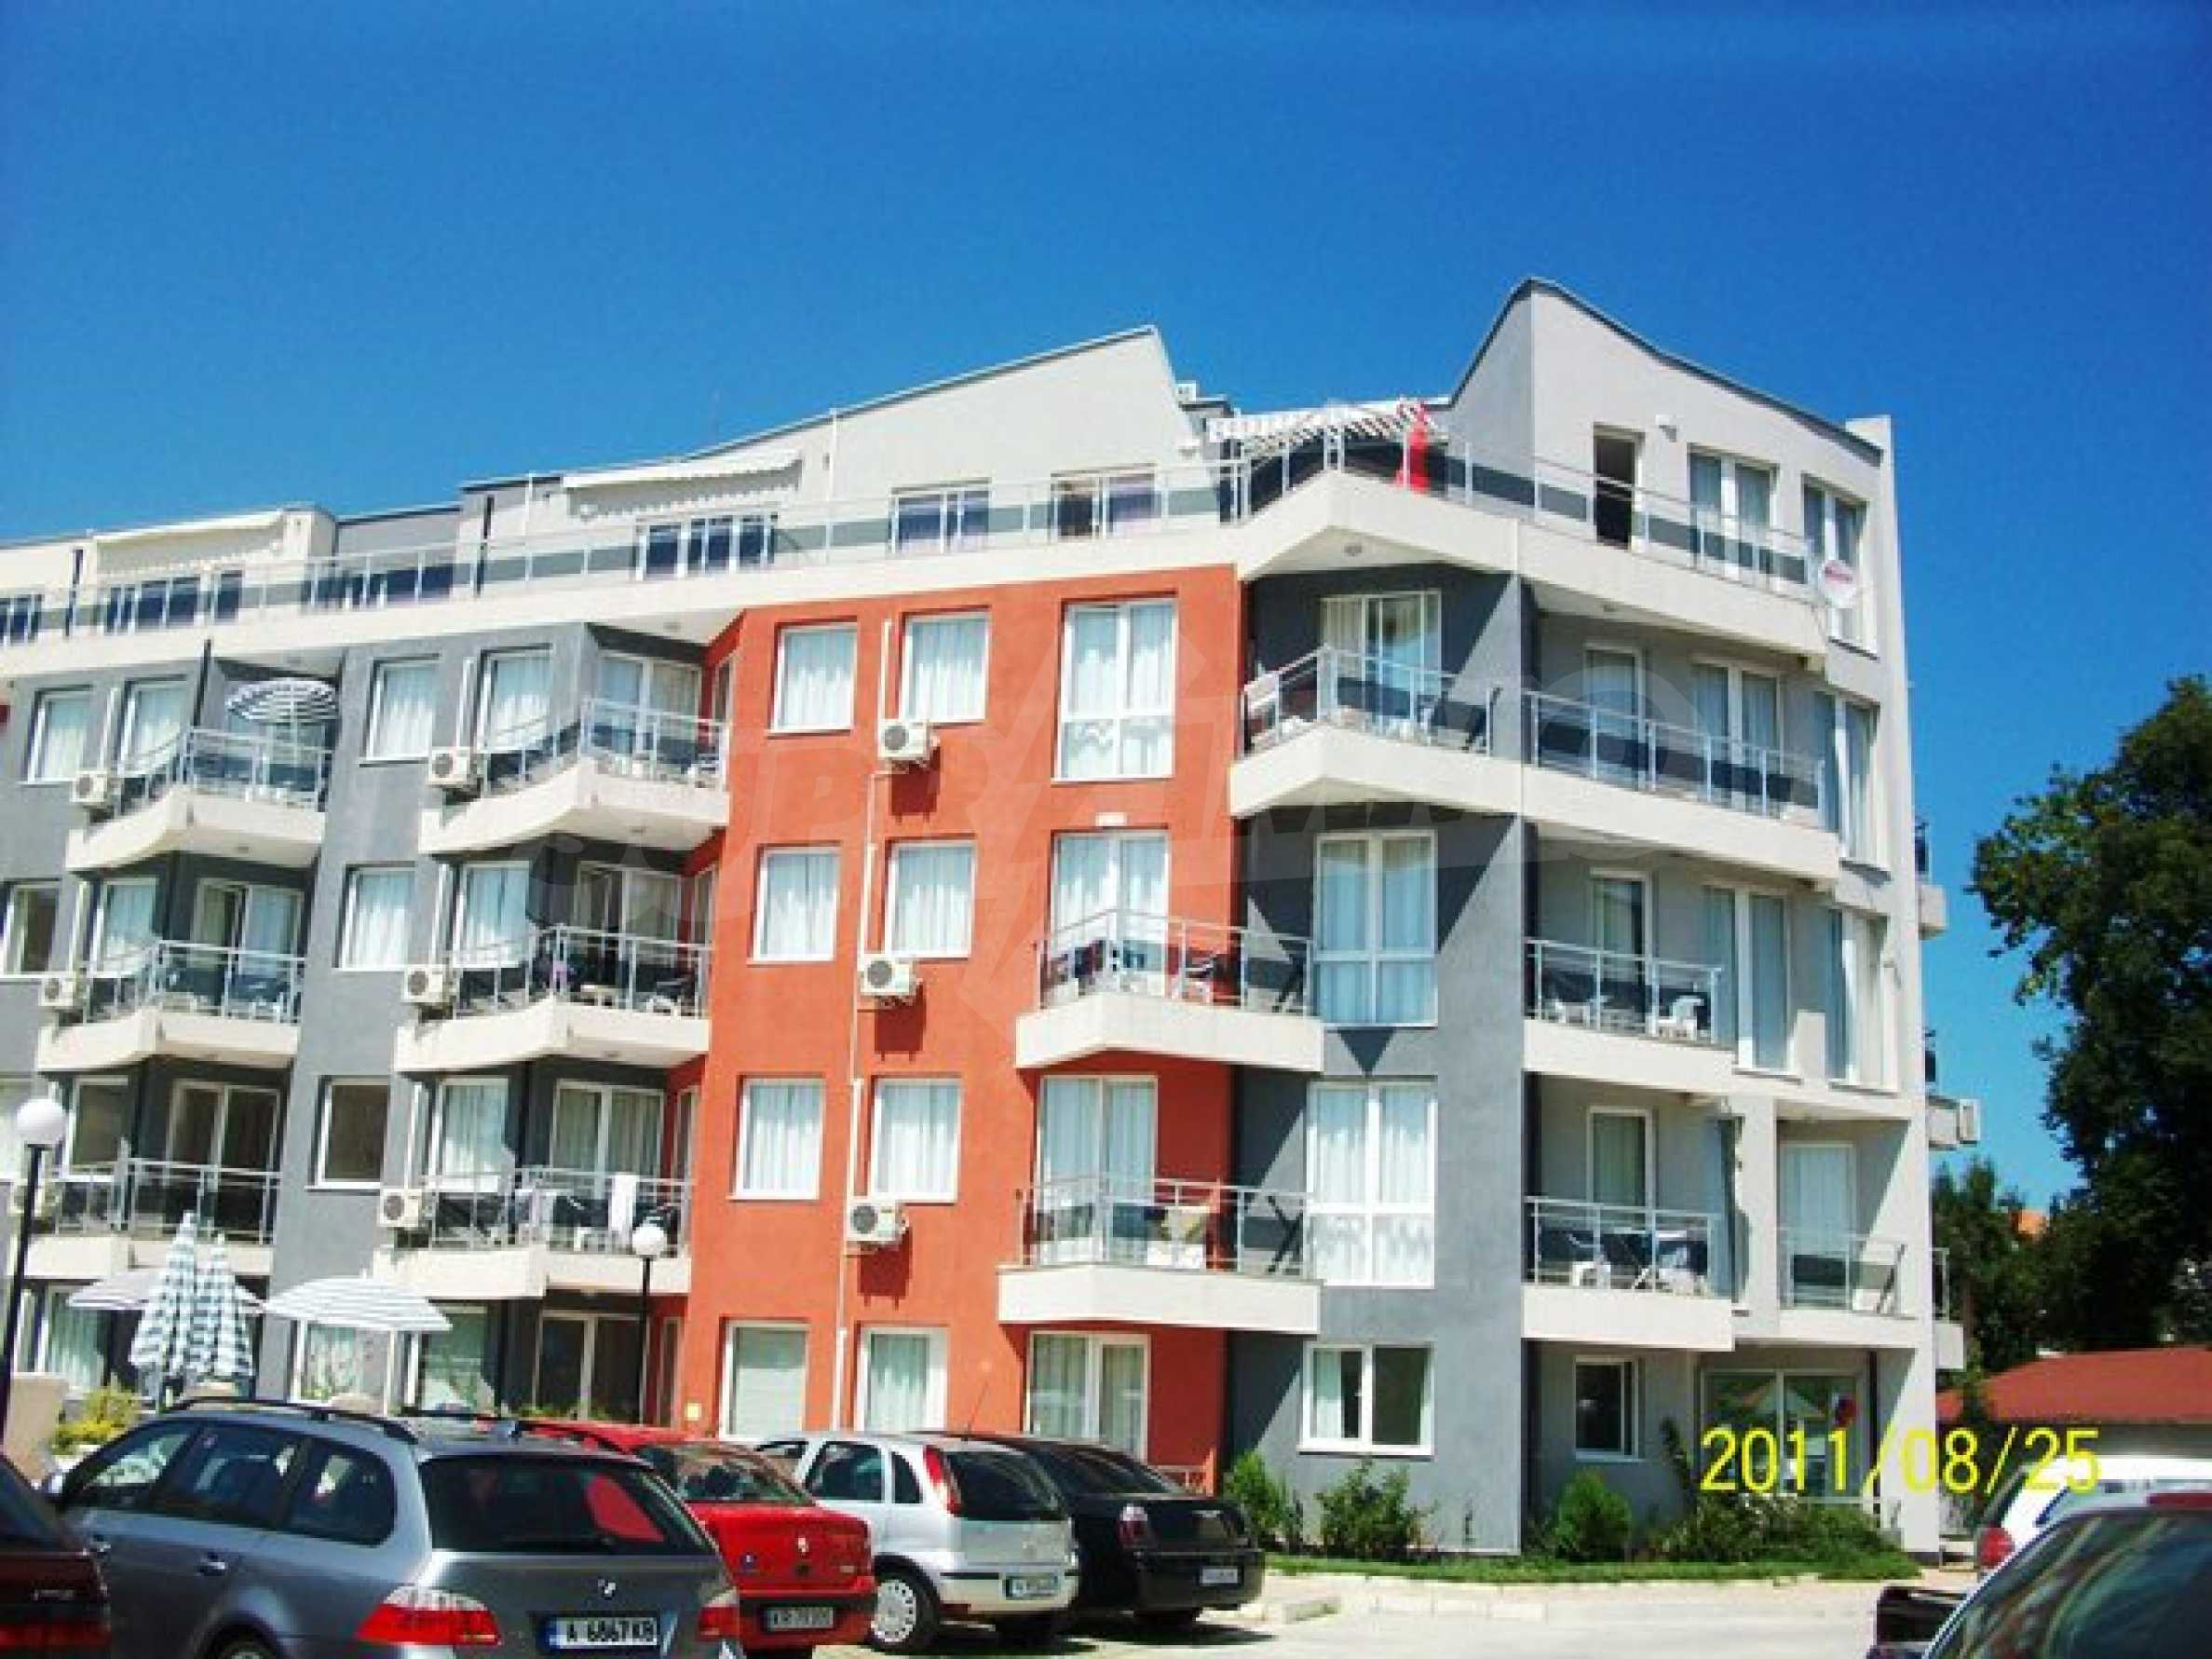 Трехкомнатный апартамент на продажу в комплексе Emberli в курорте Лозенец 4